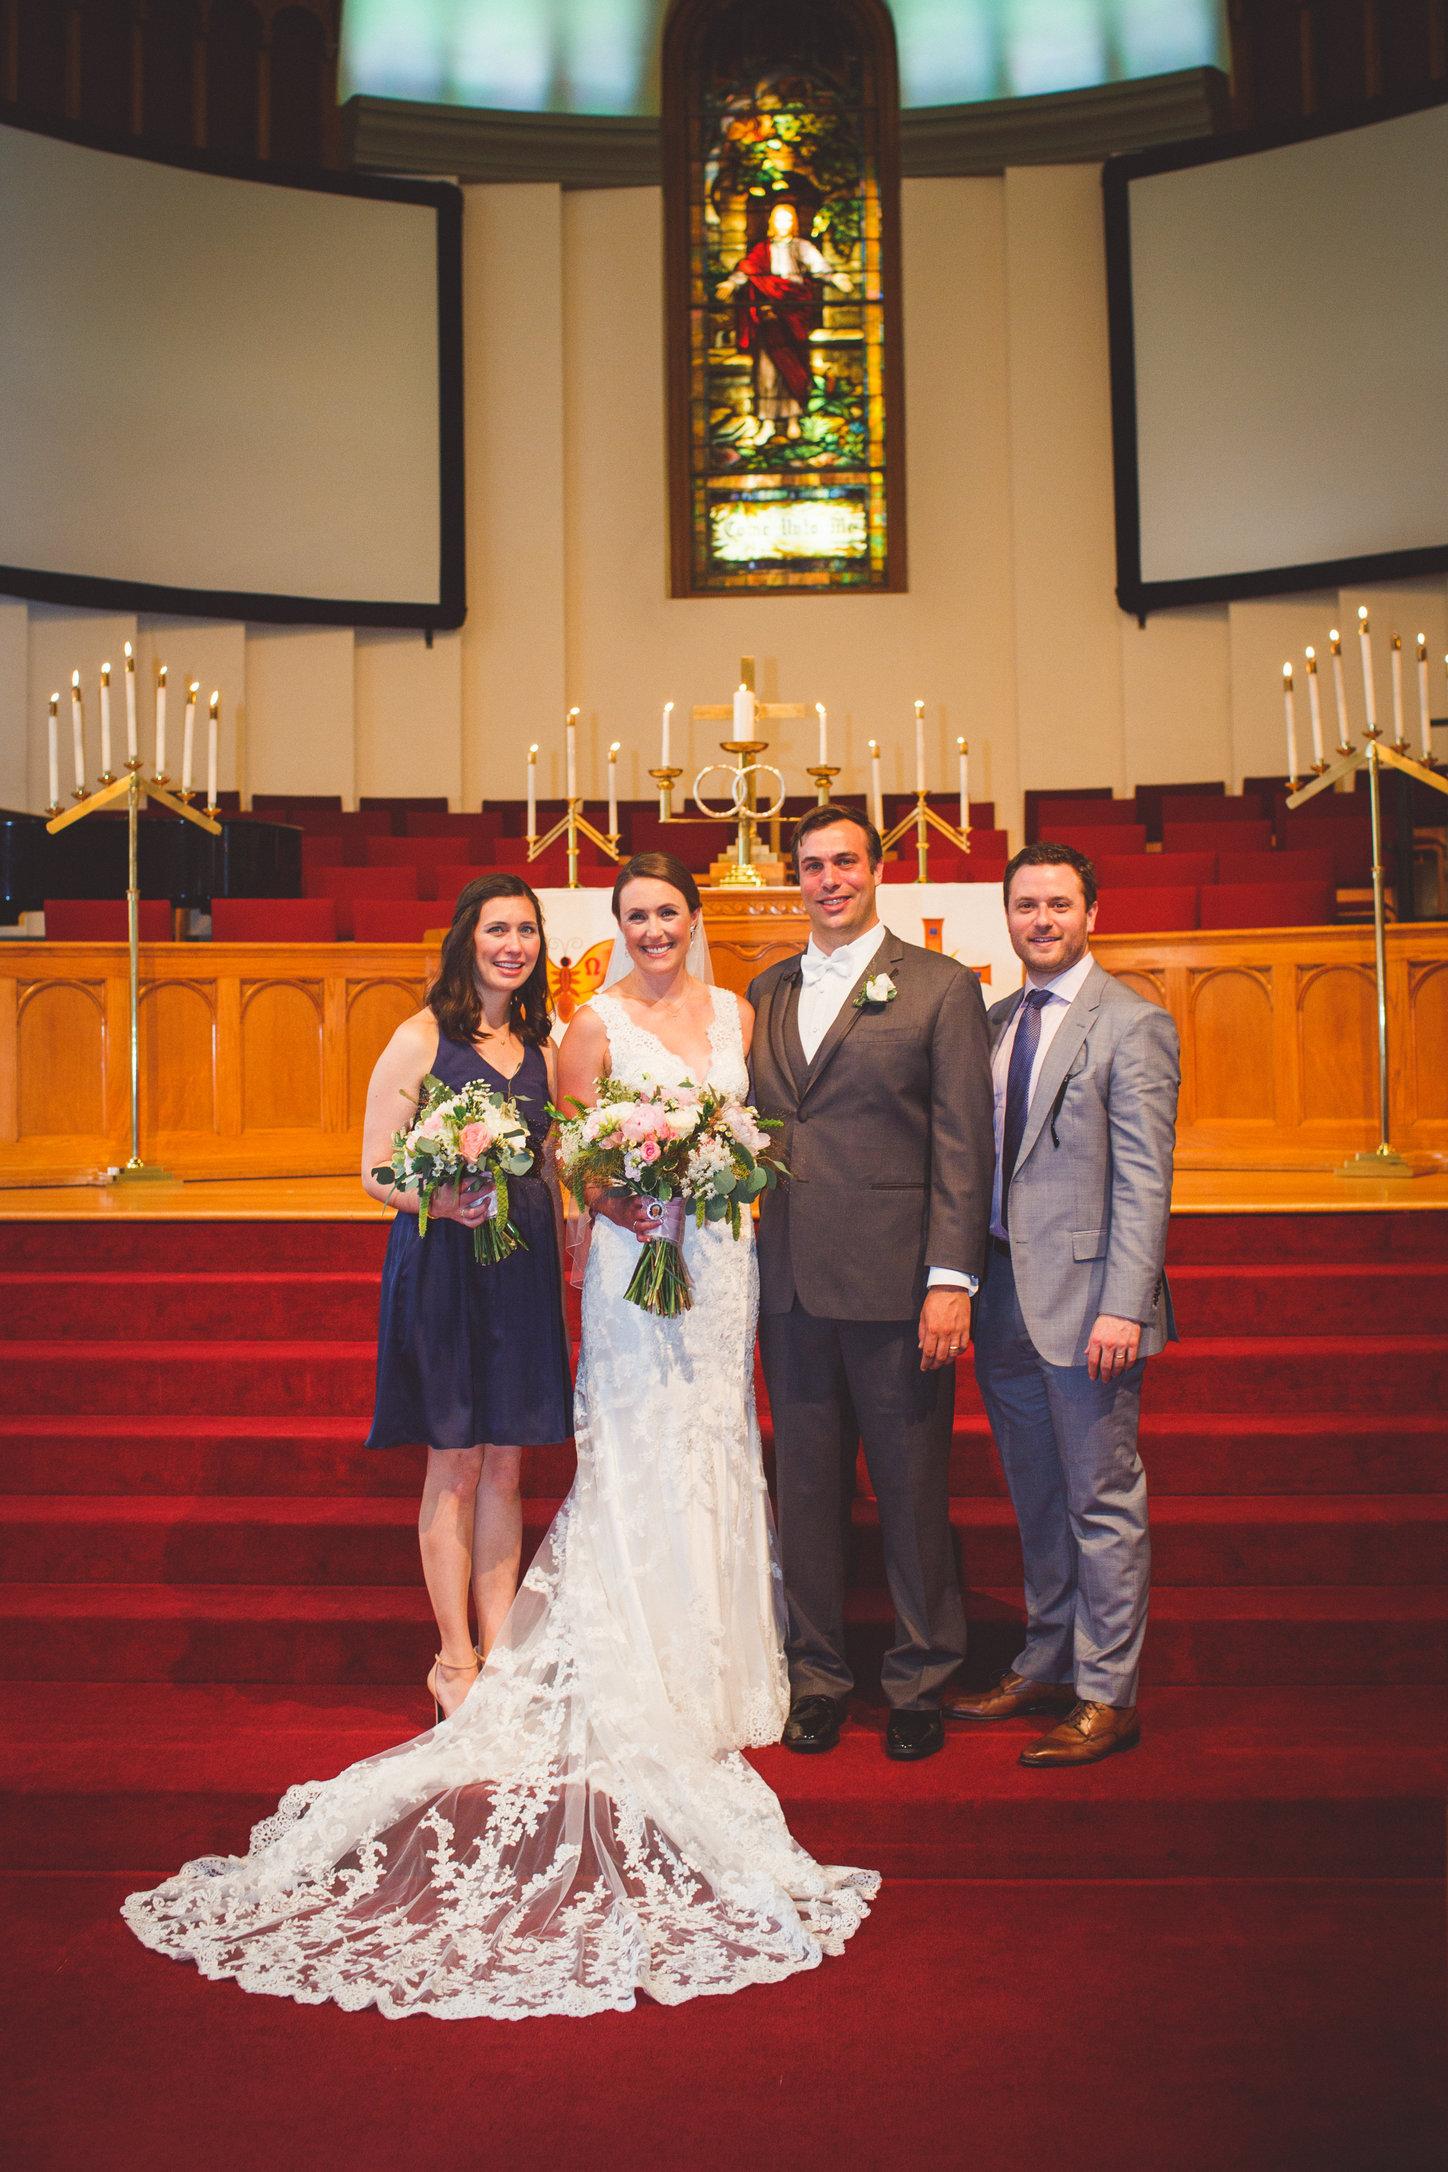 SandC-wedding-260.jpg